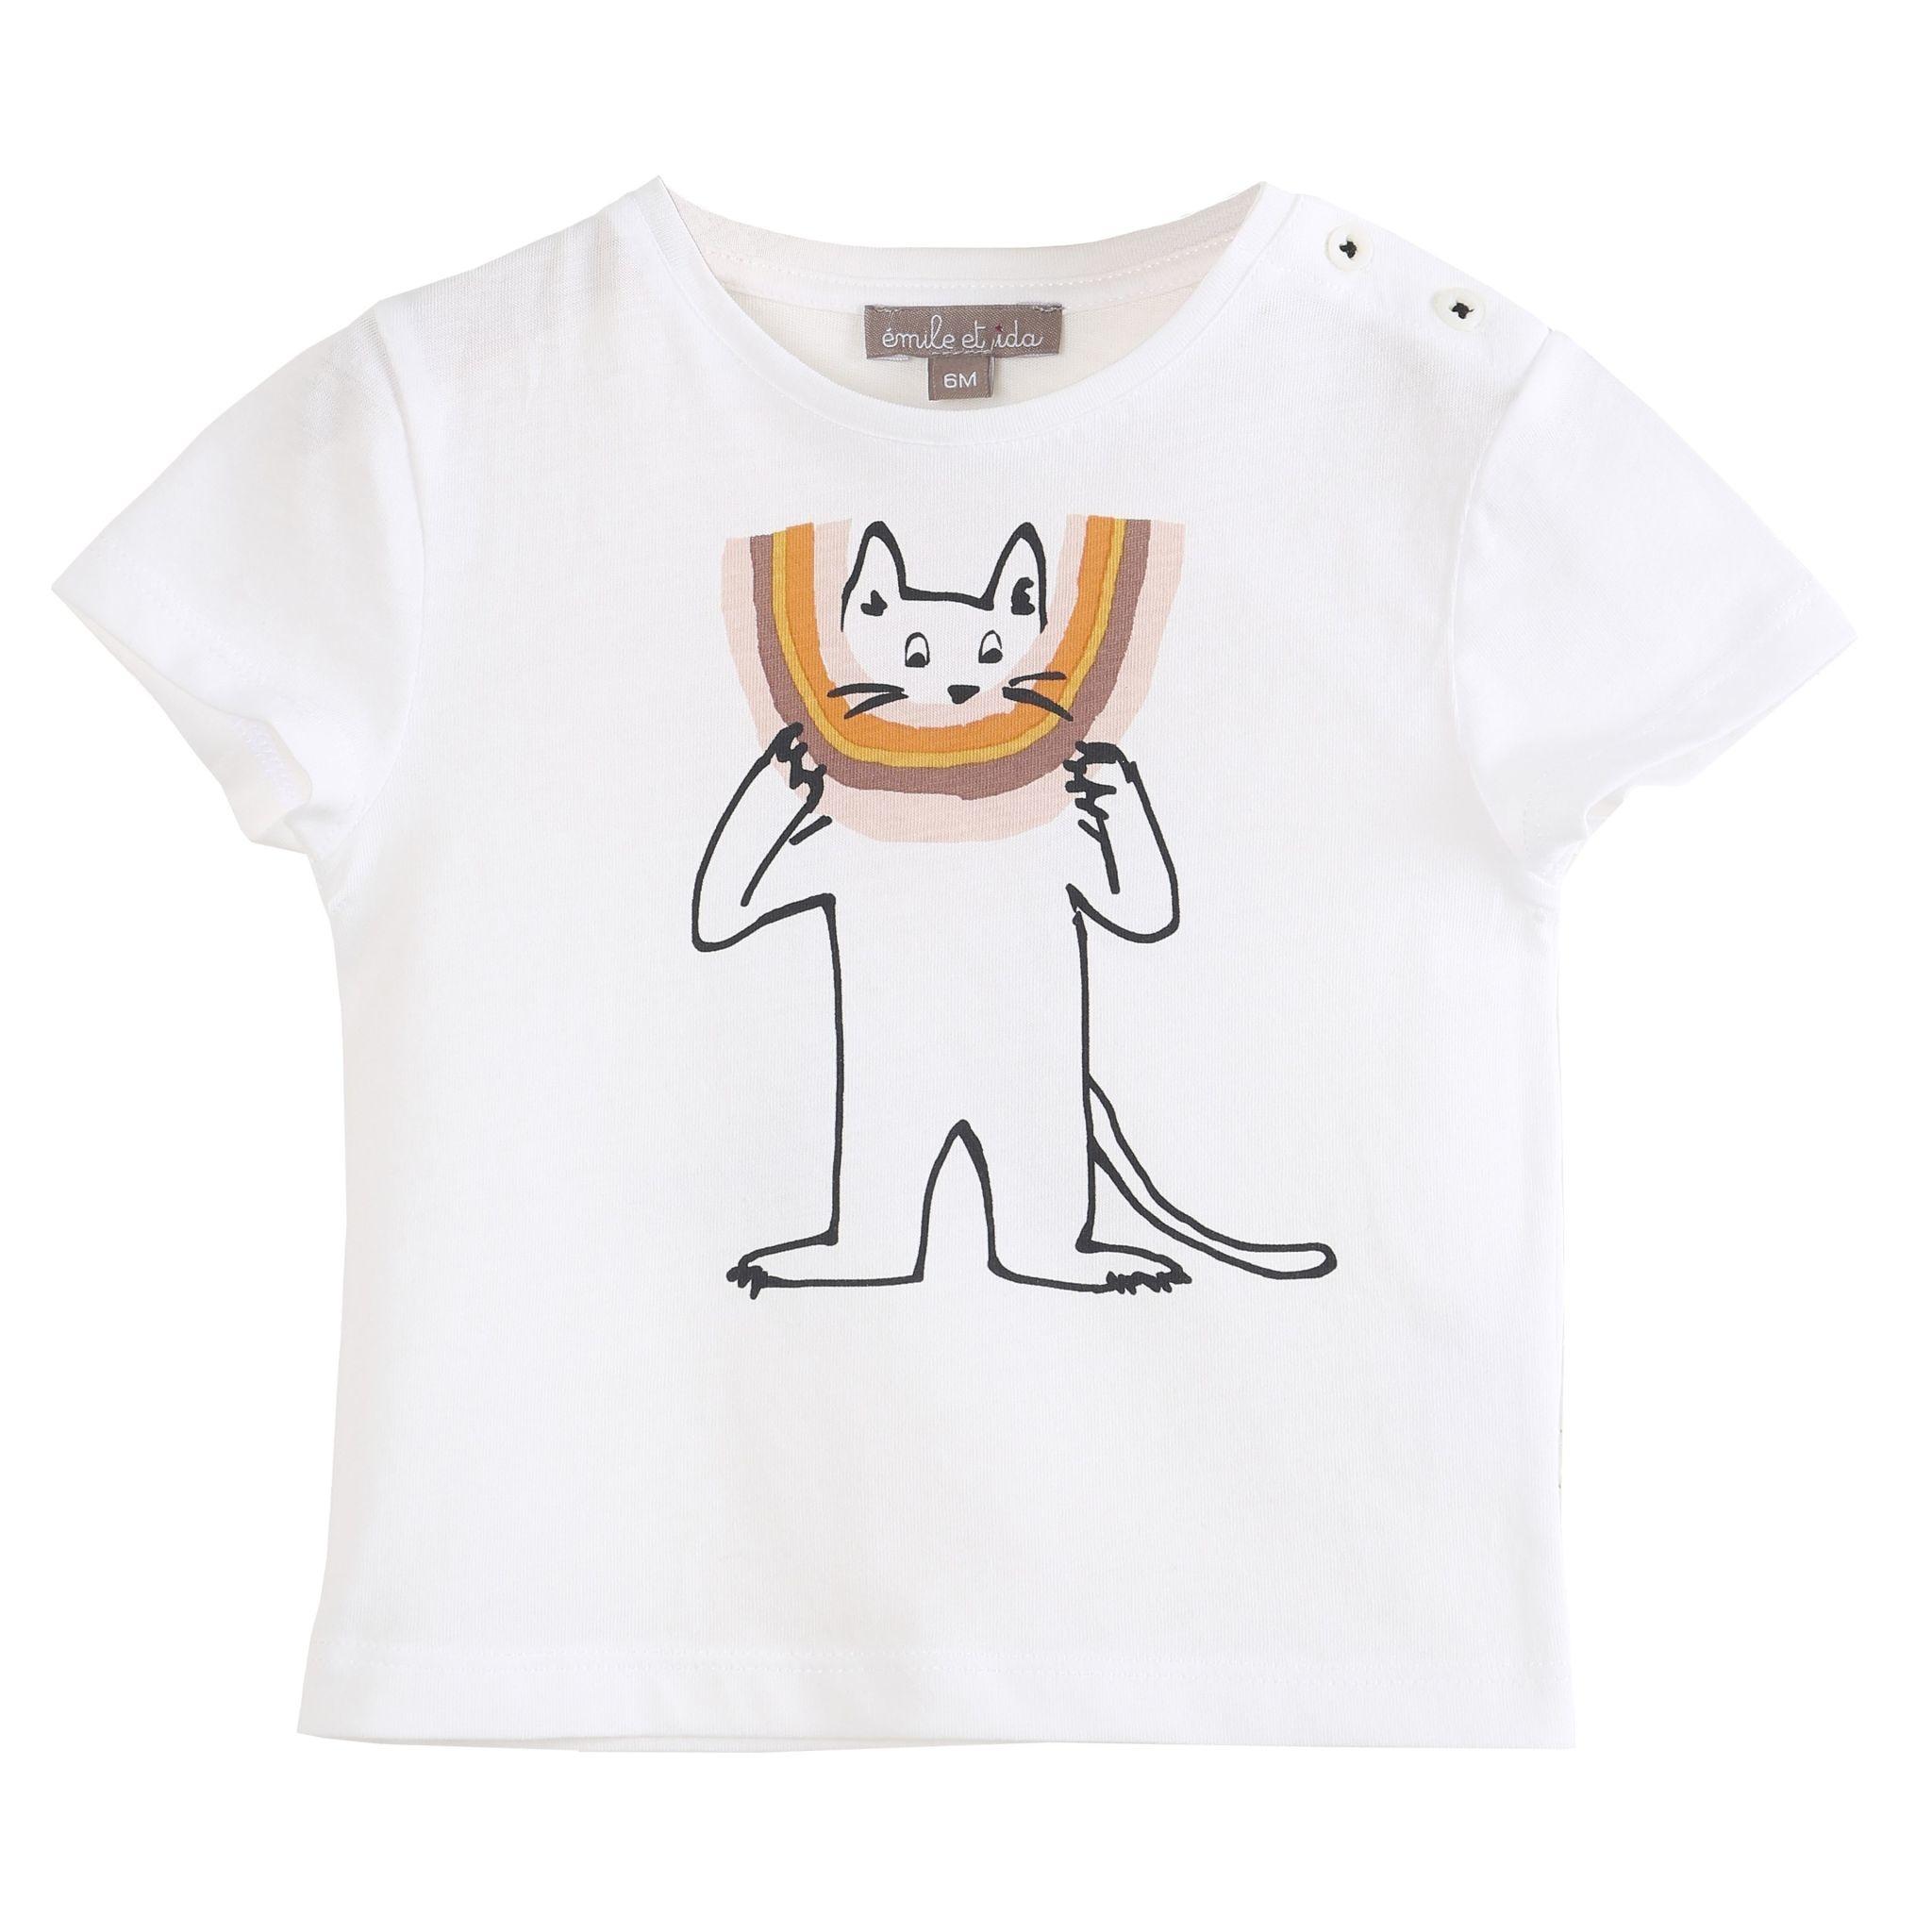 EMILIE ET IDA Printed Tee Shirt